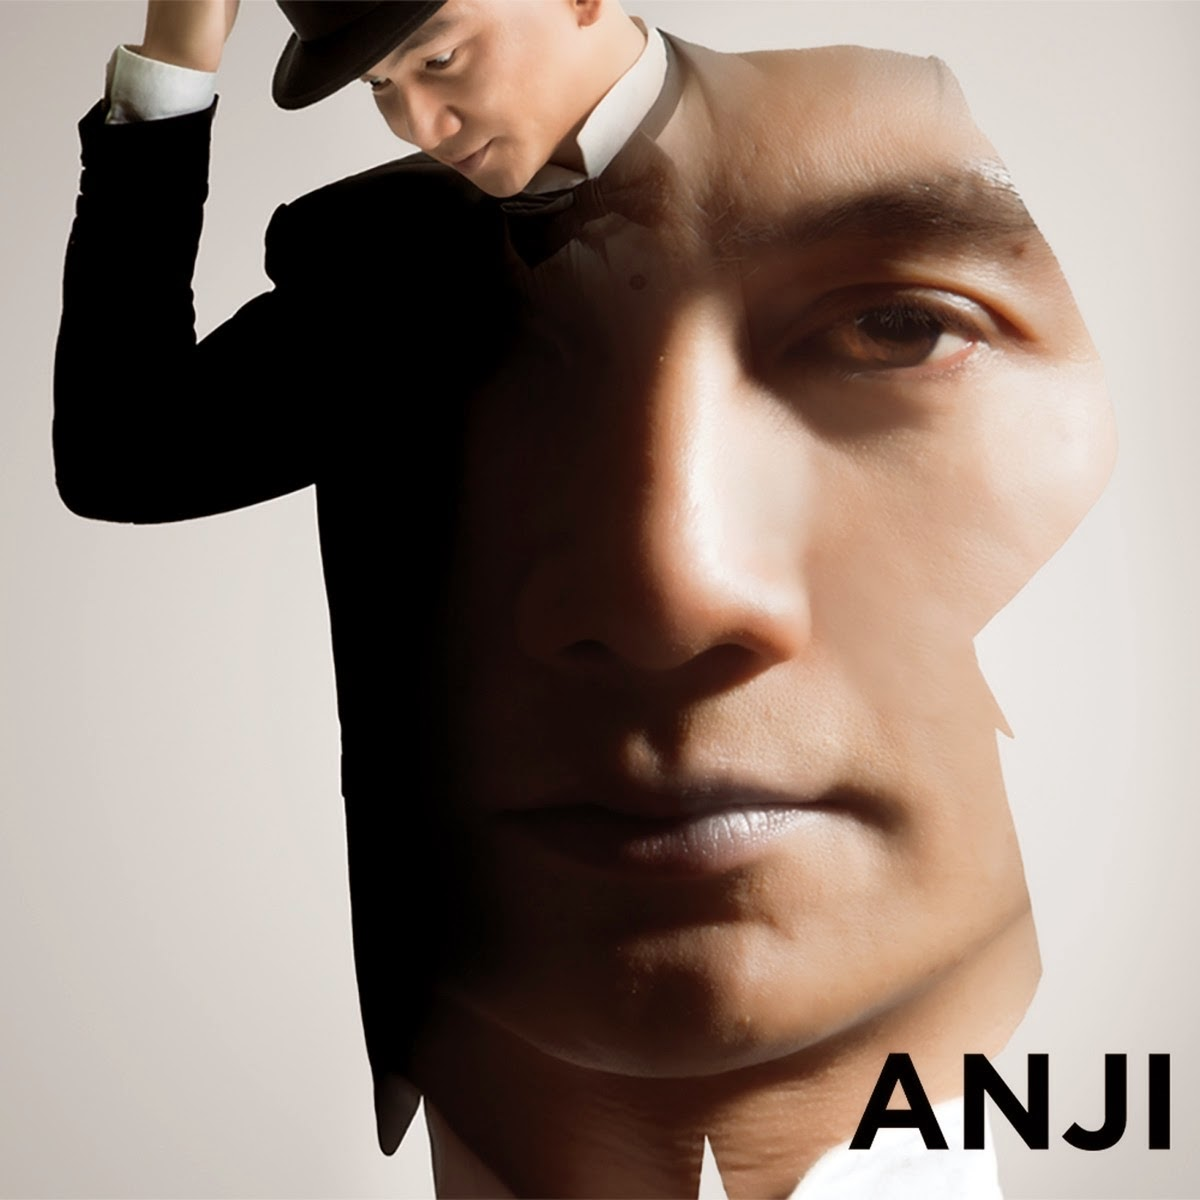 Download Anji - Anji (2014)